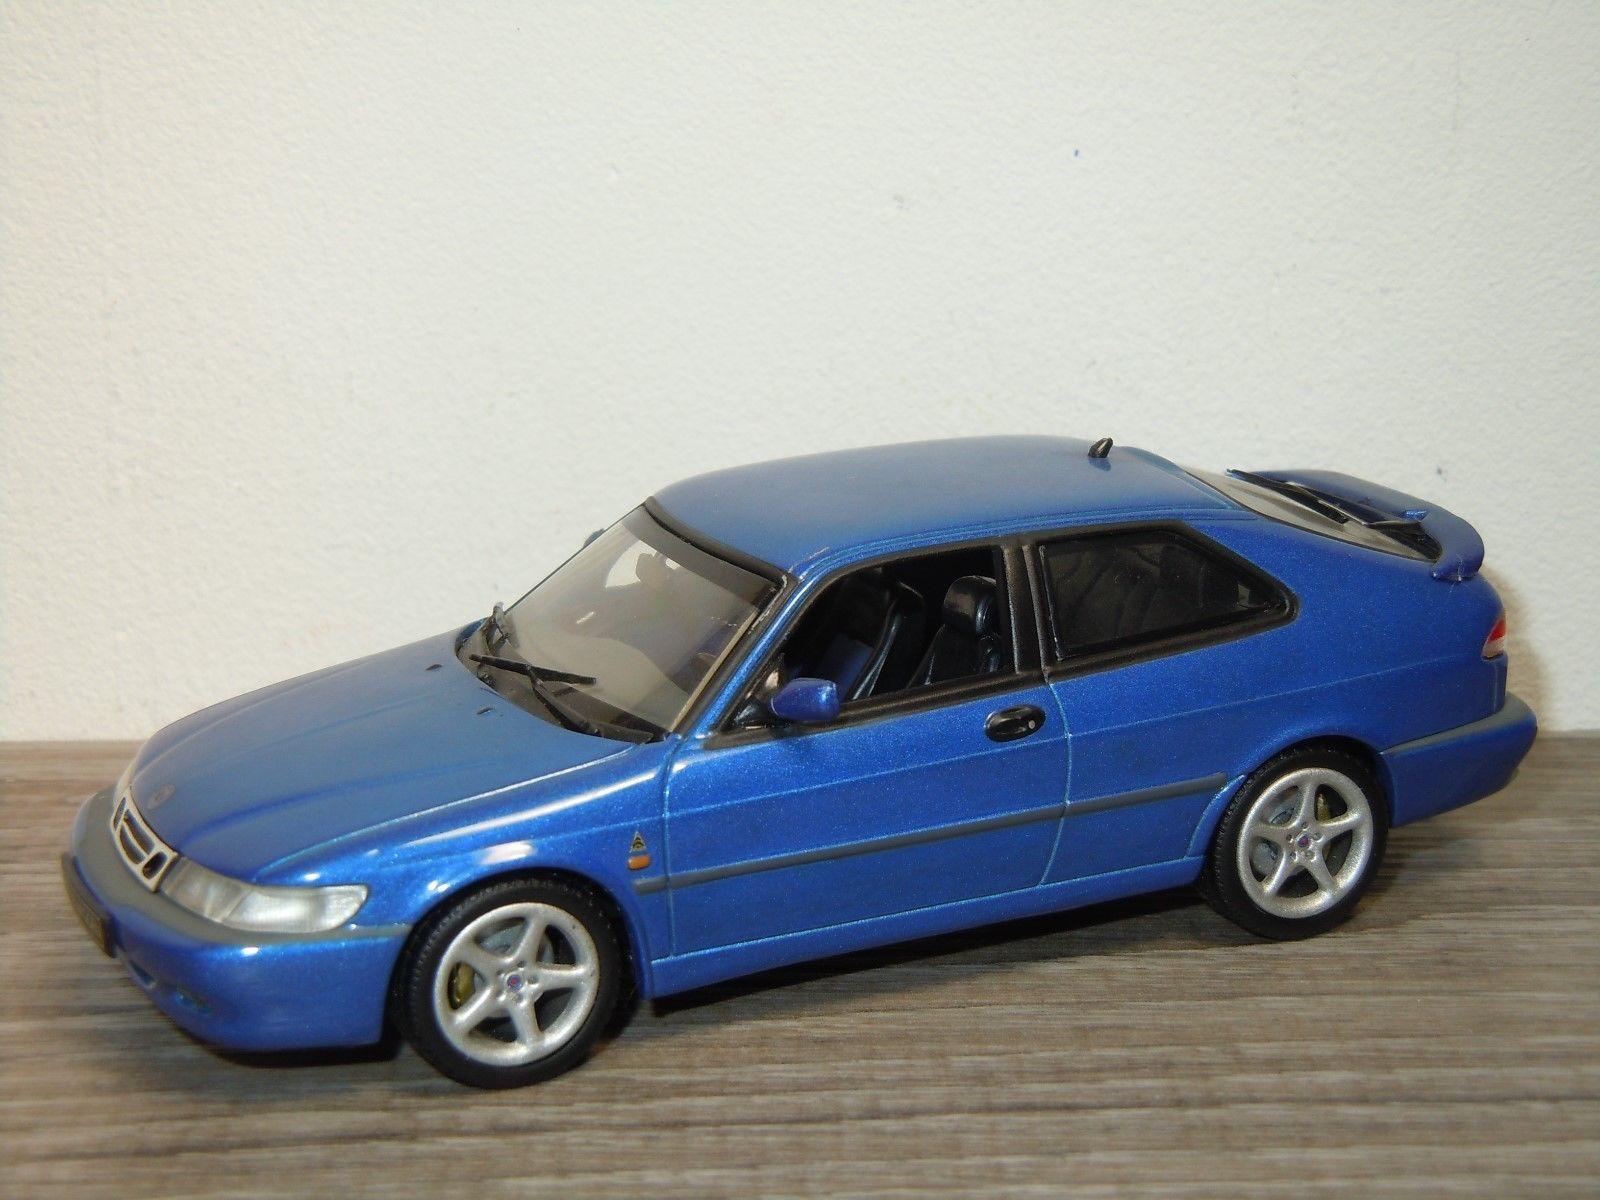 Saab 9 3 Coupe Viggen Minichamps 143 Saab 9 3 Coupe Car